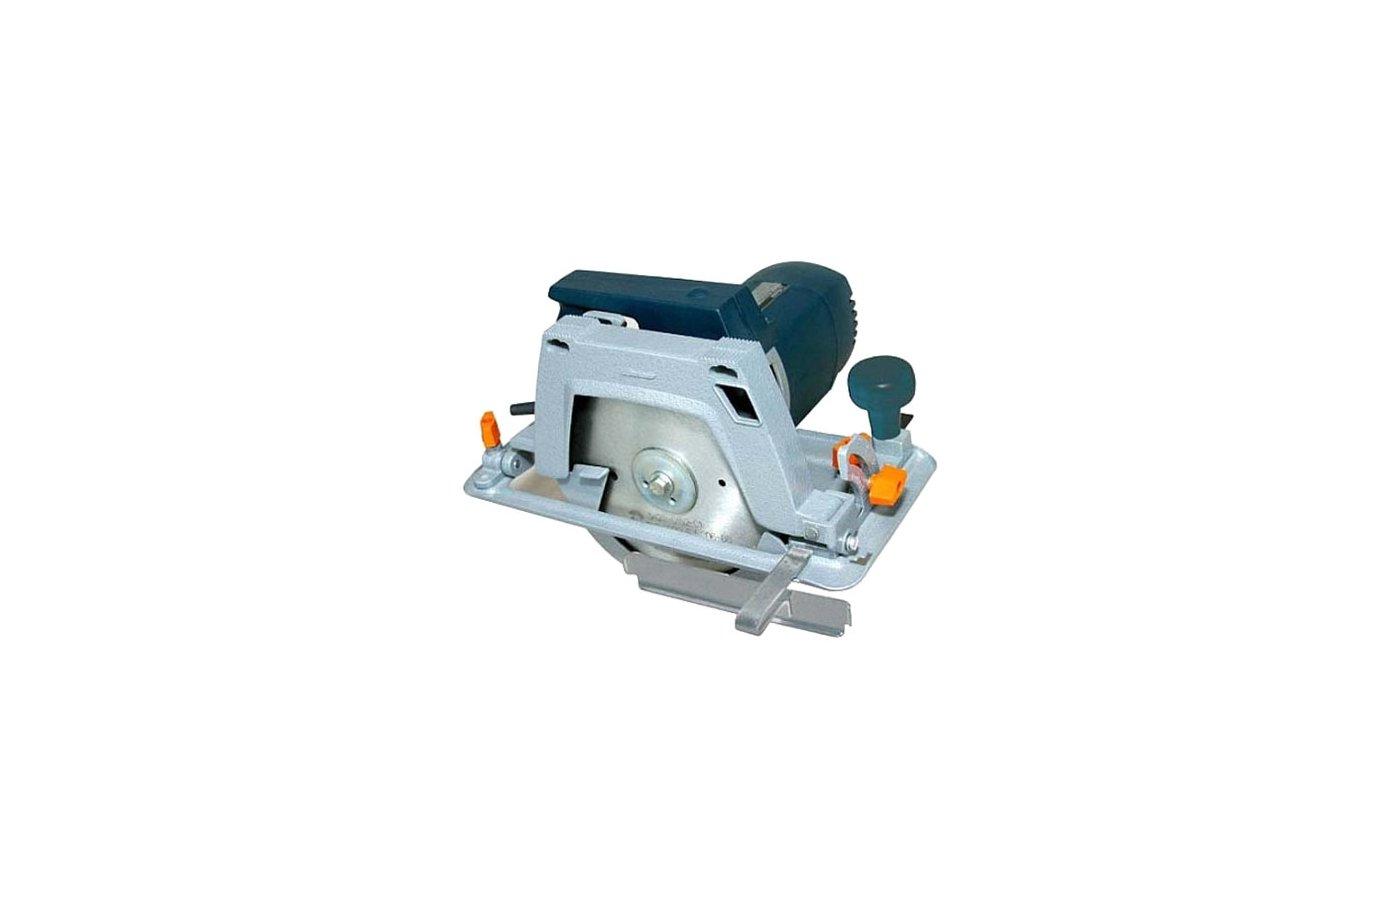 Электропила дисковая Rebir IE 5107G2